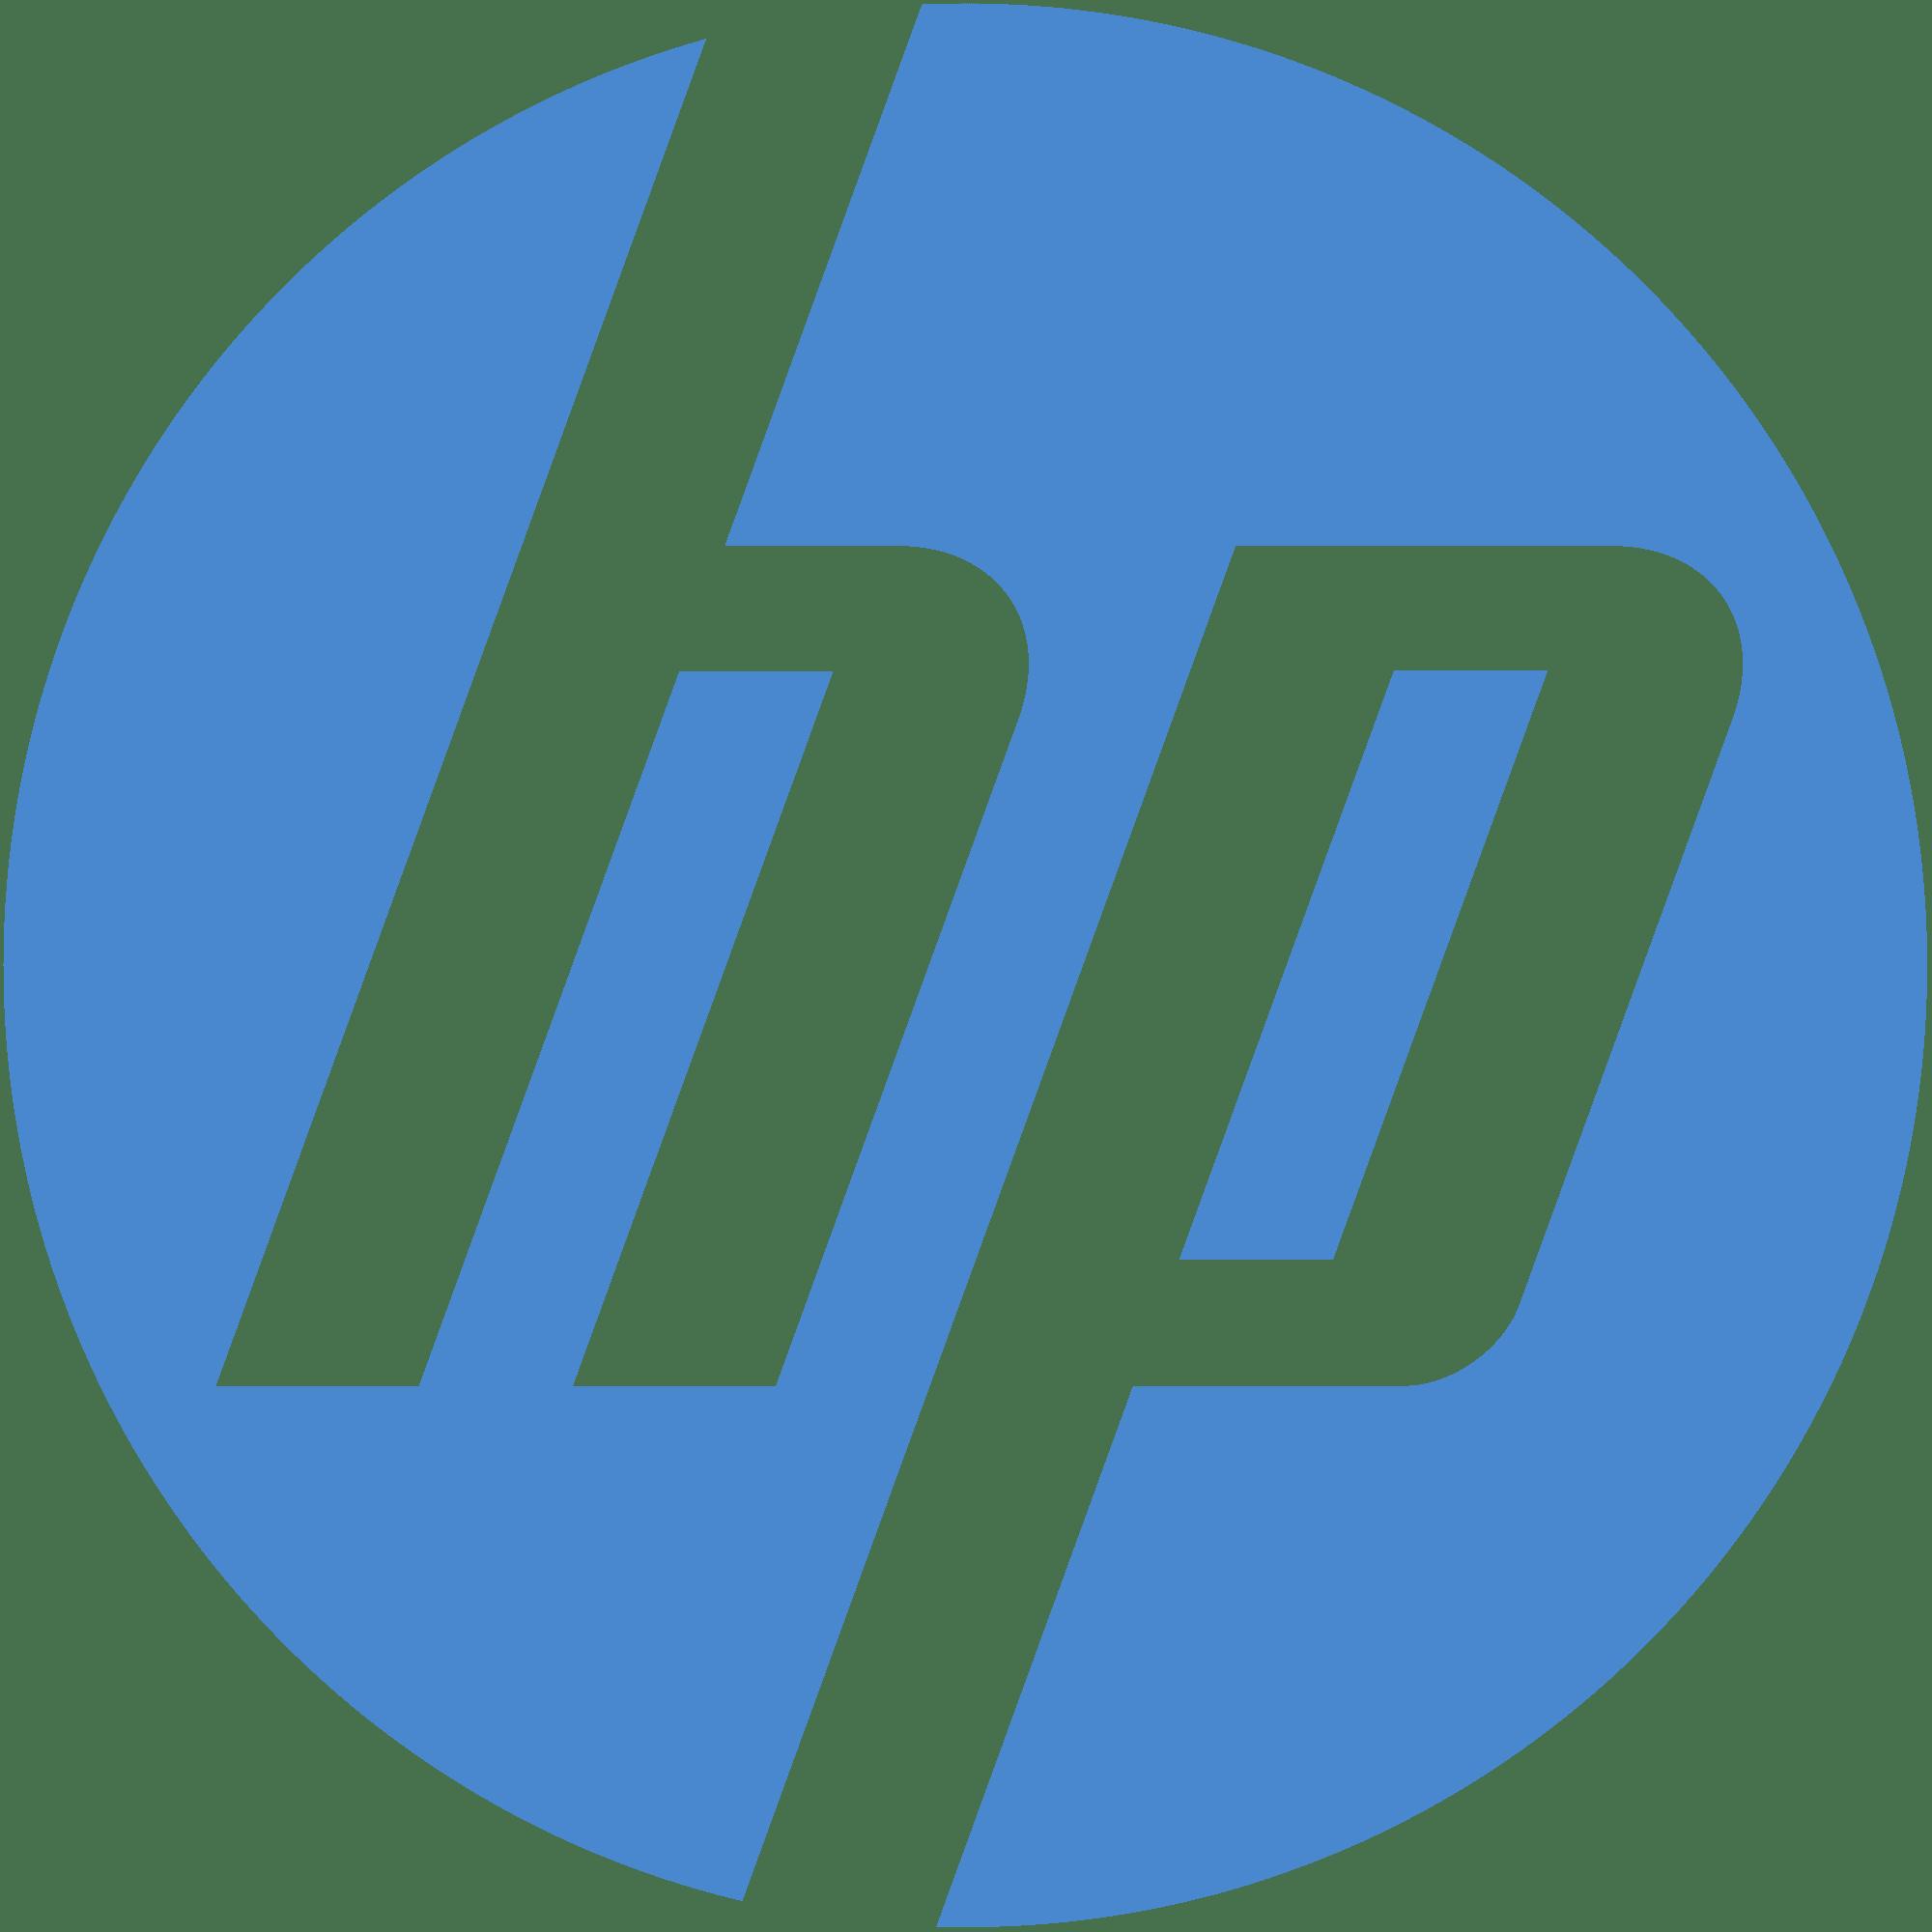 HP Compaq LA1951g 19-inch LCD Monitor drivers